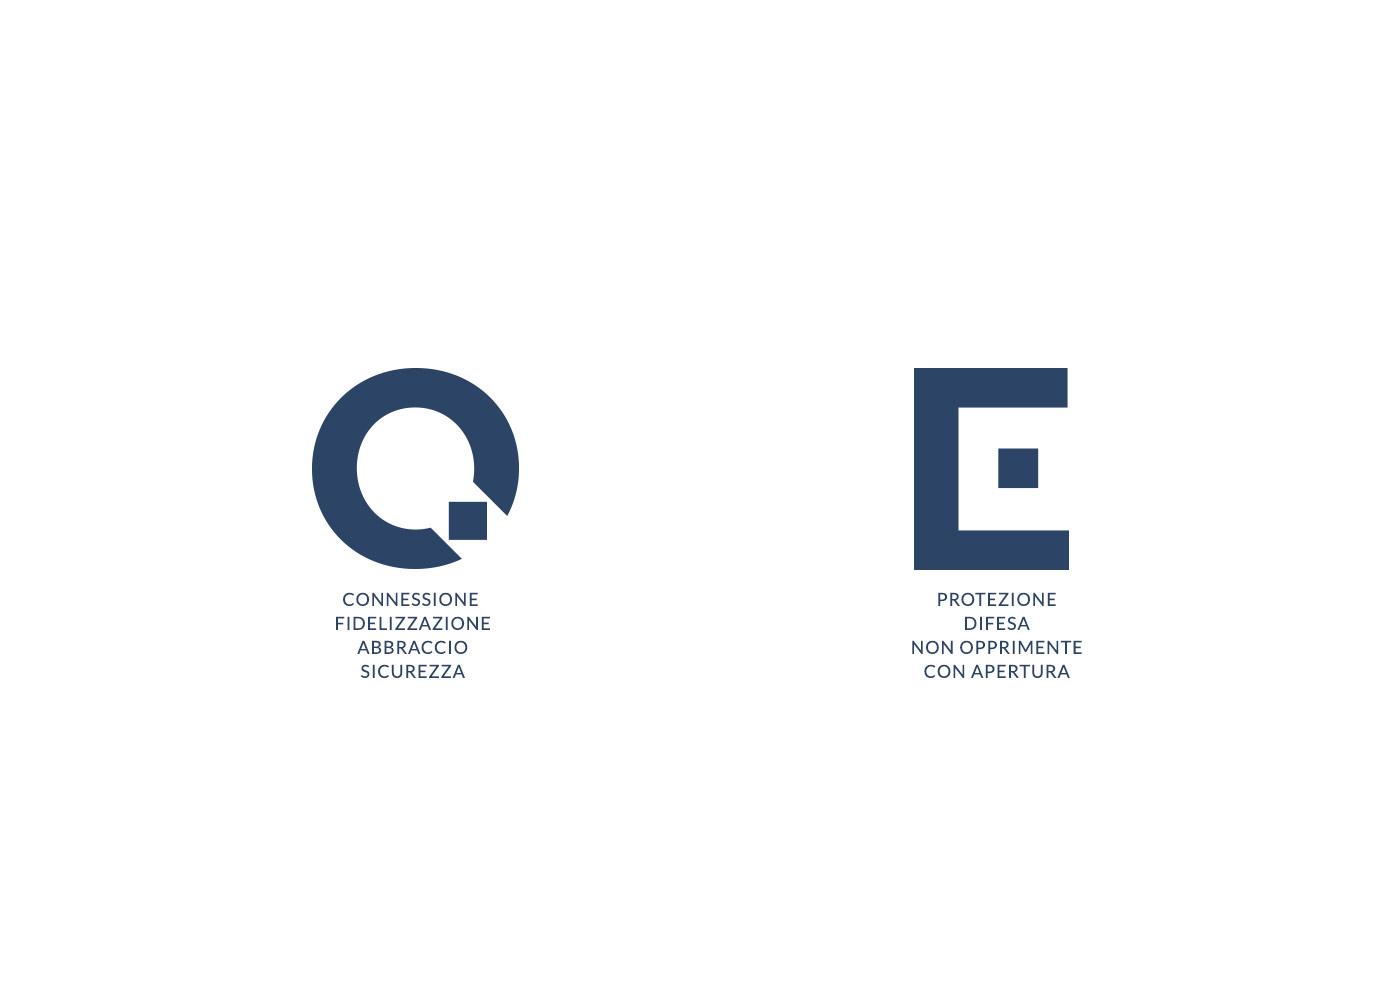 grafioc milano squareup logo 03